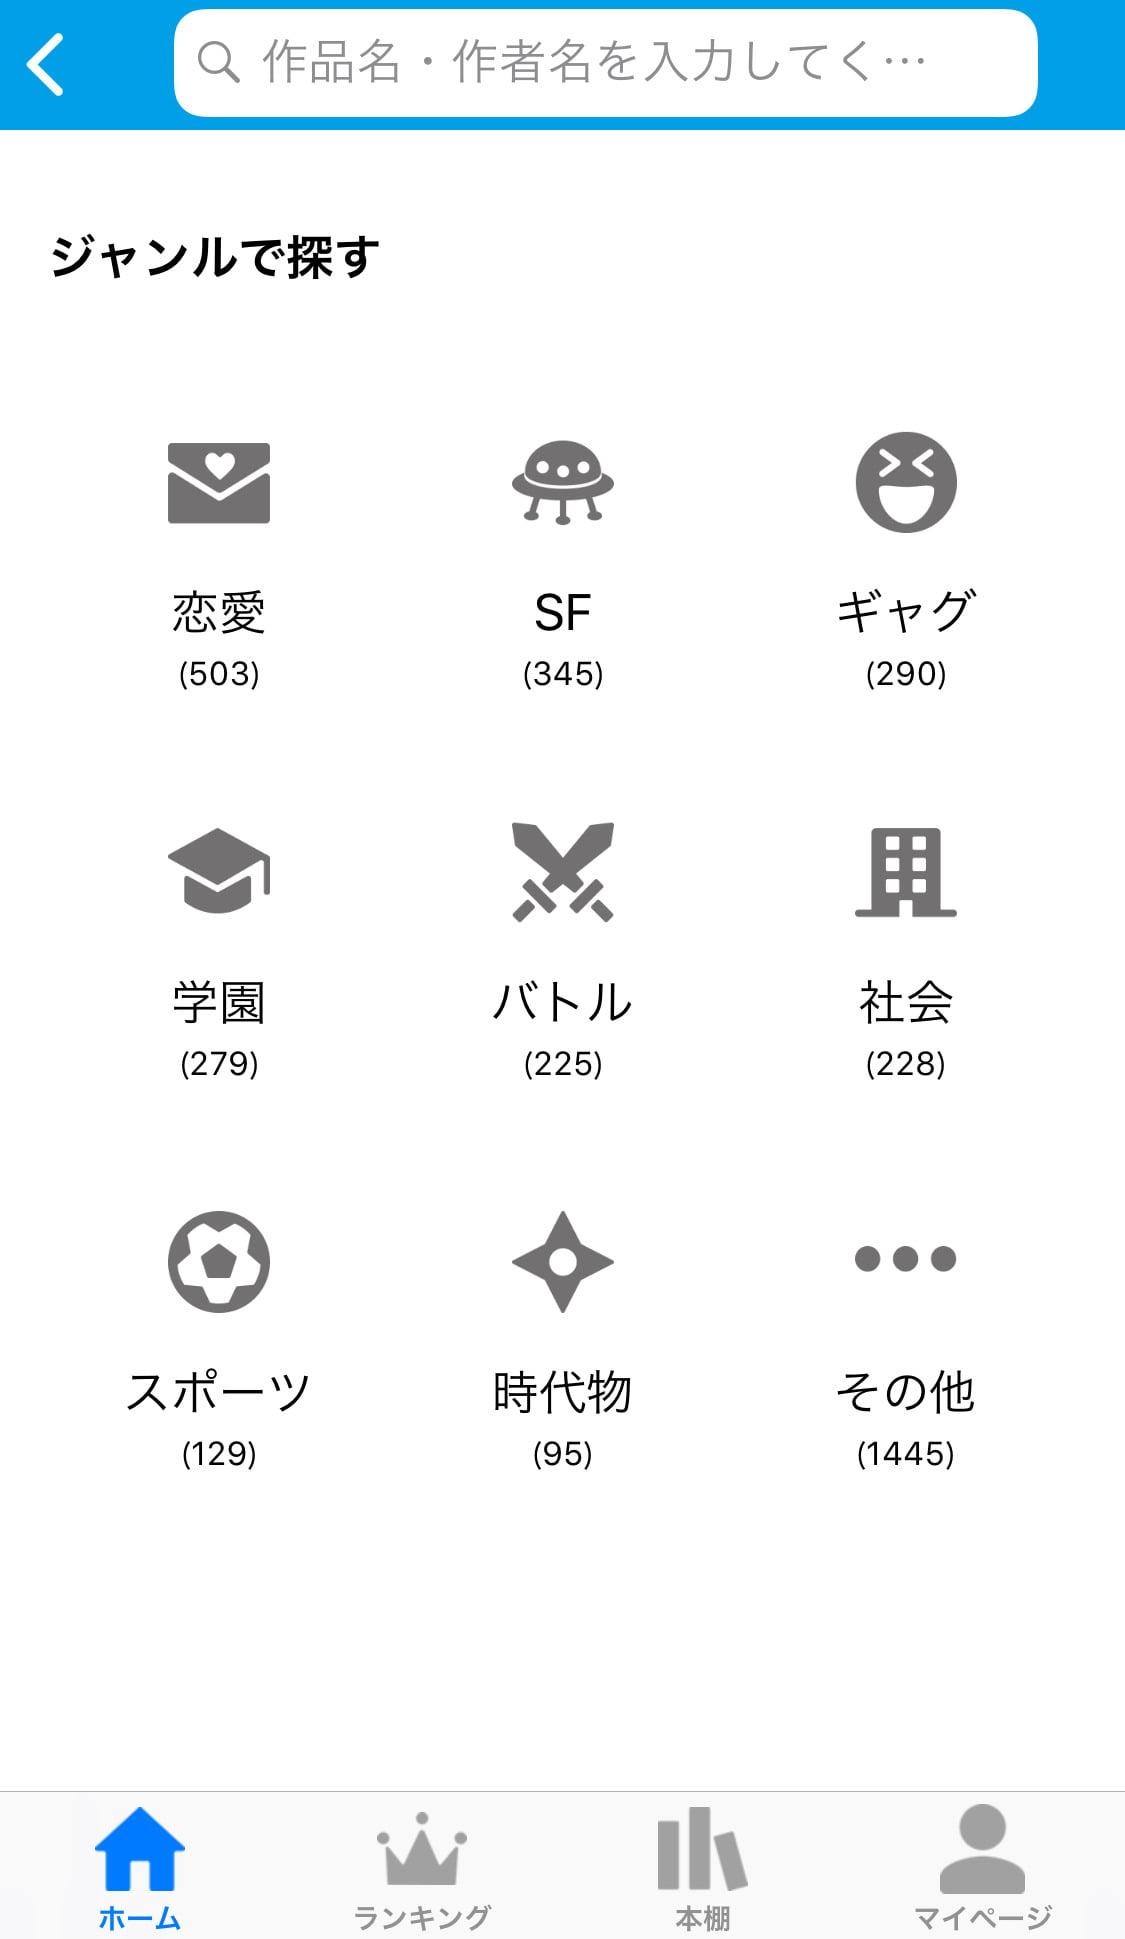 マンガ図書館Z検索画面